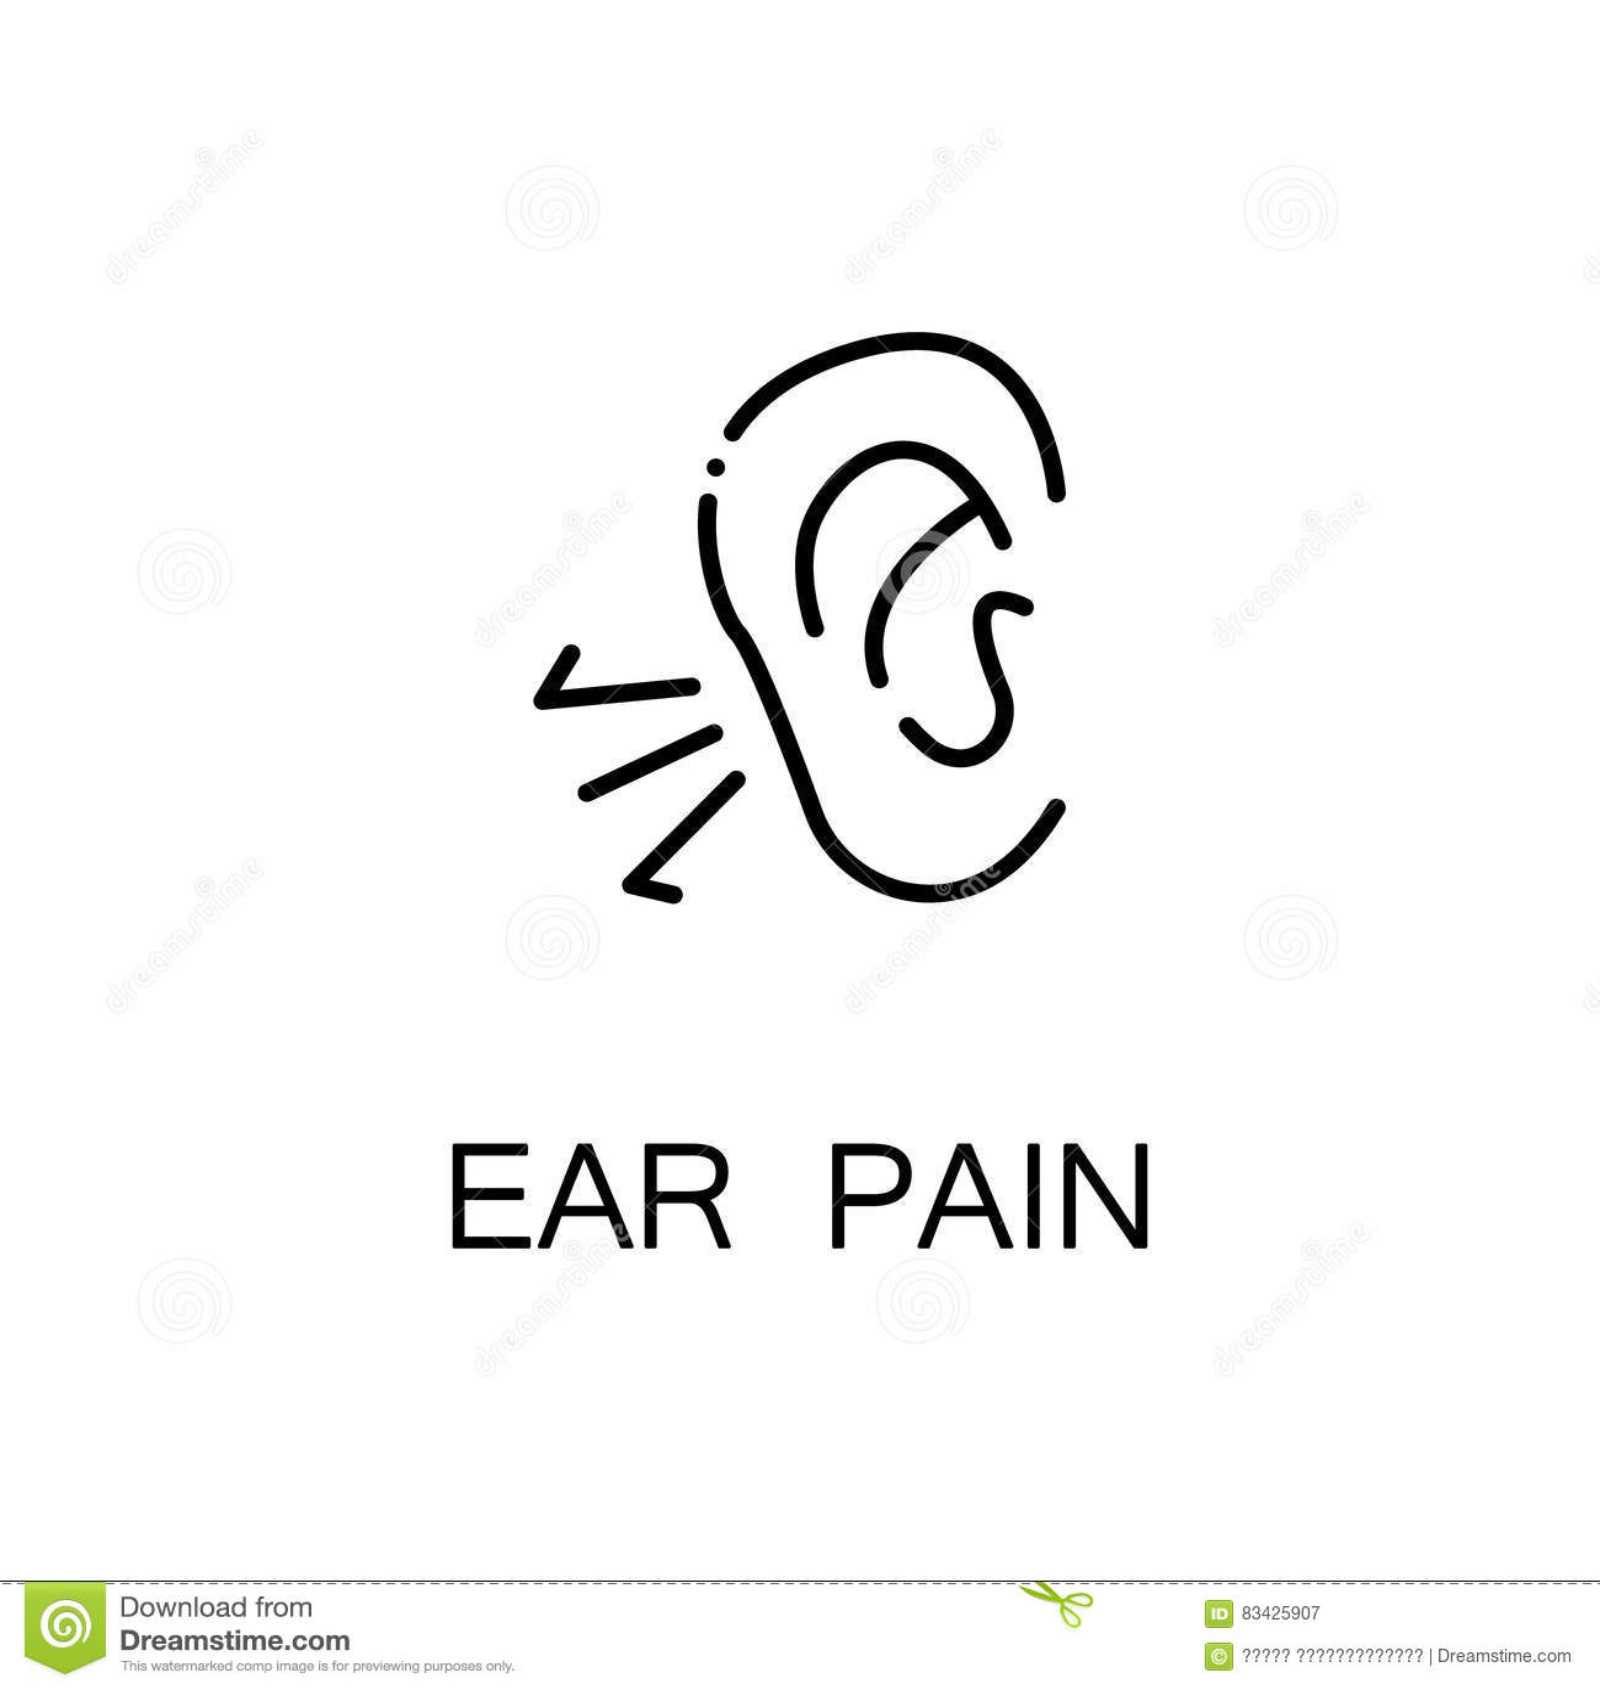 Nose Eye Mouth Ear Pictogram Vector Illustration